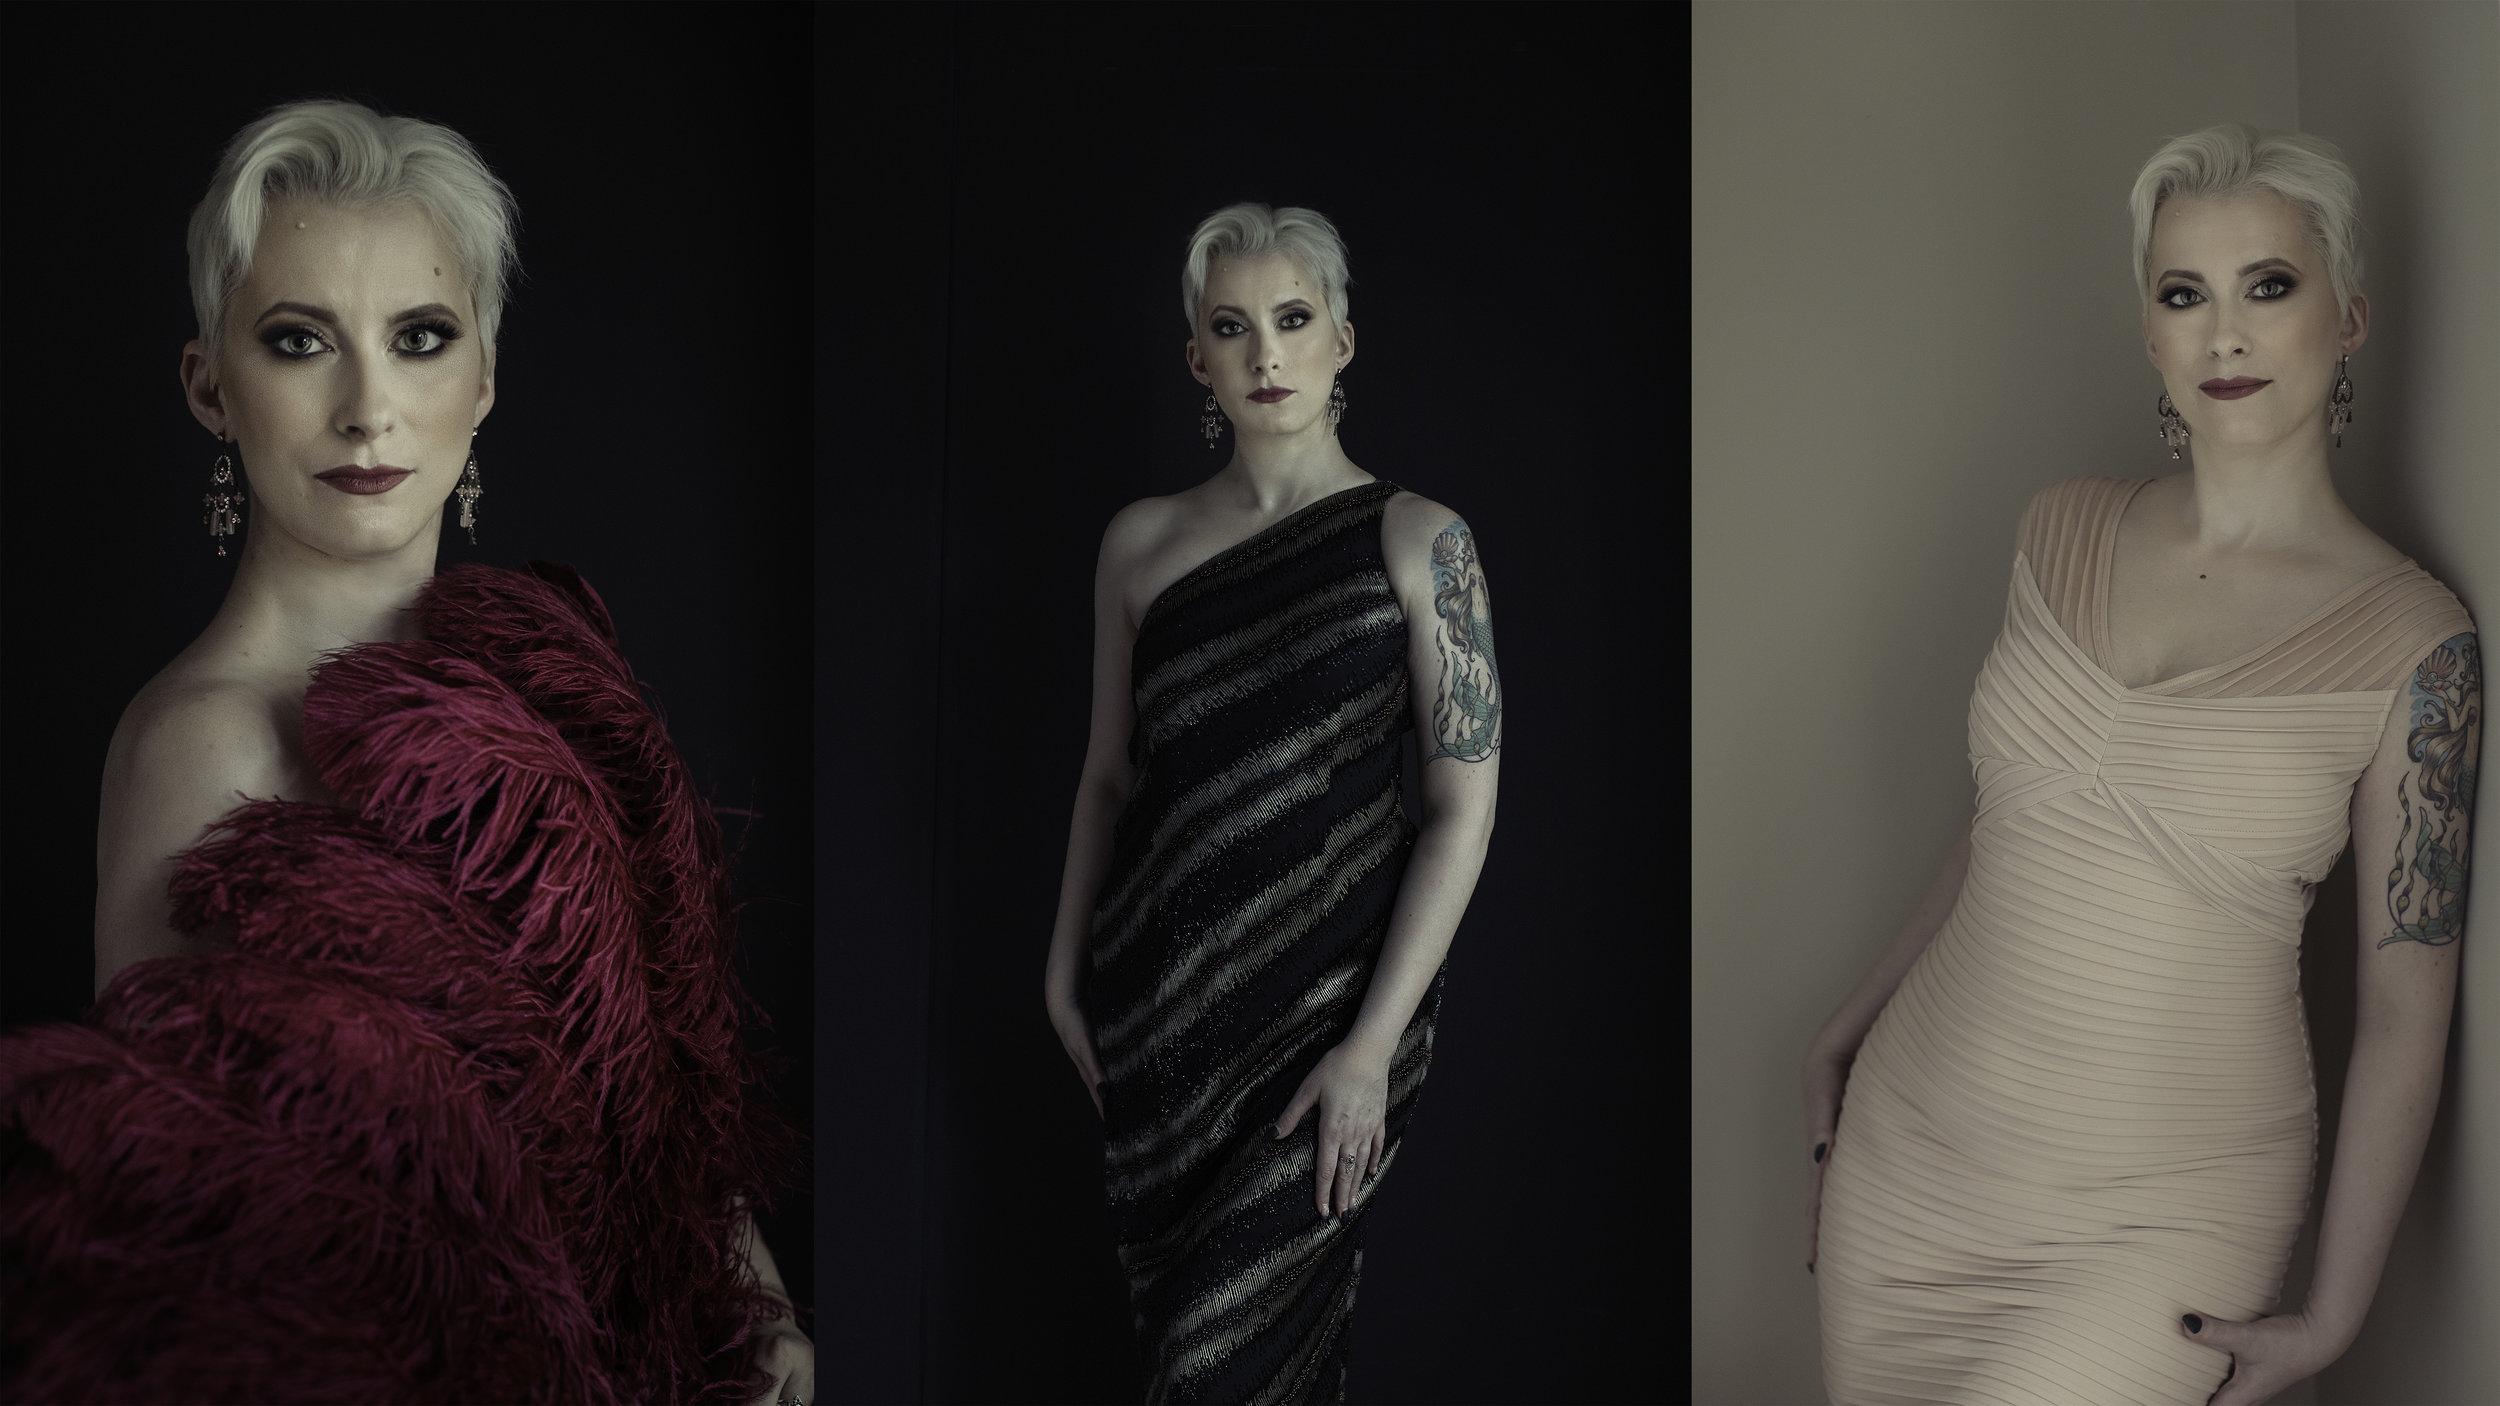 mel collage.jpg